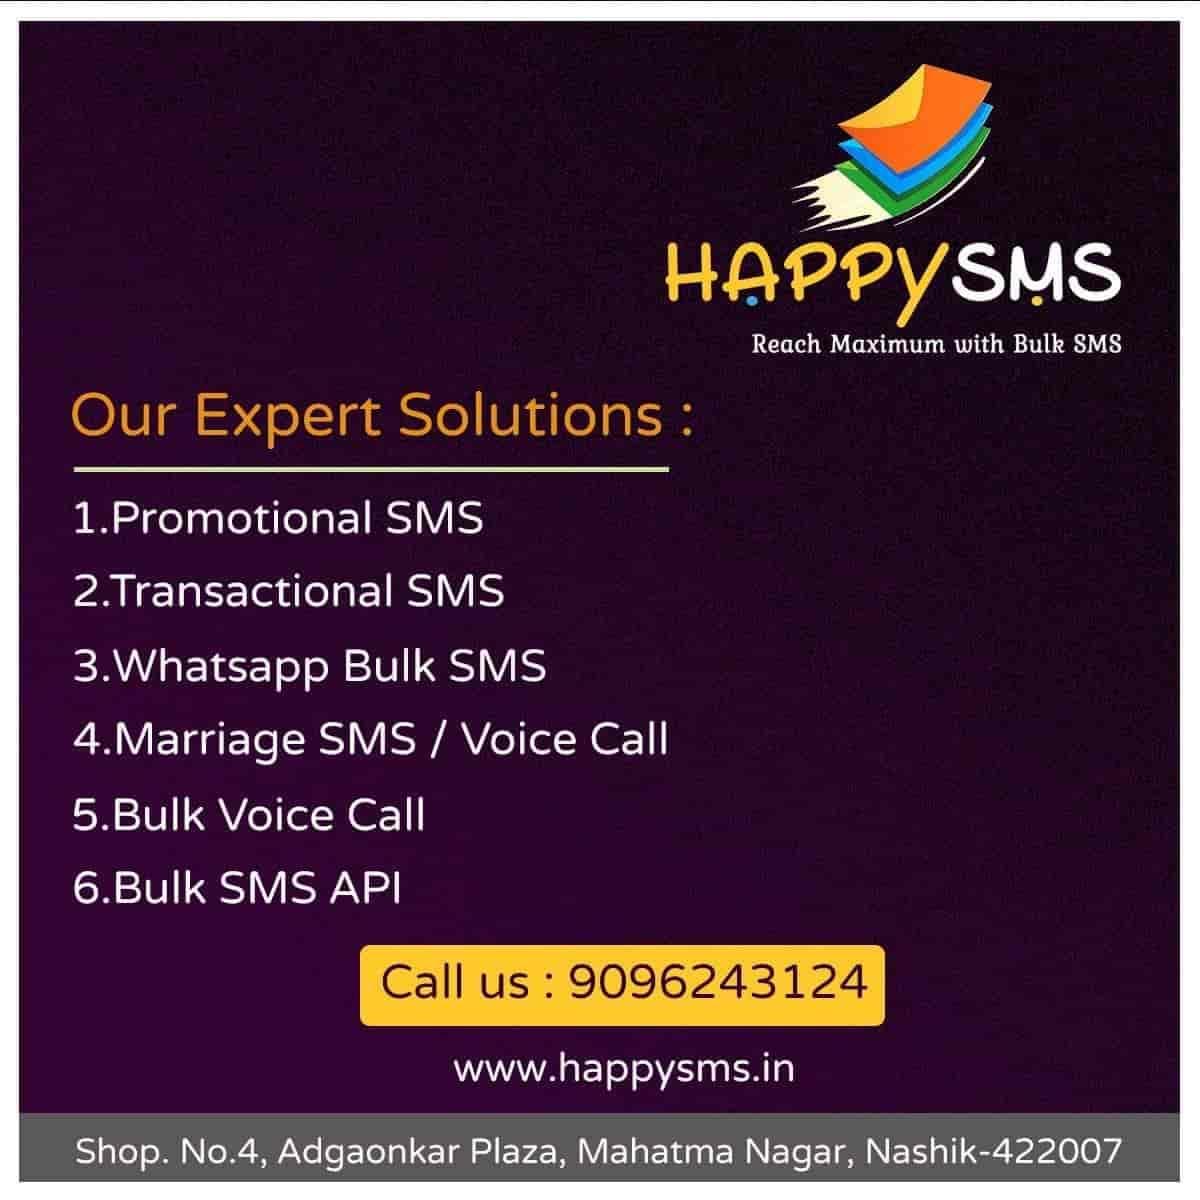 5f7c4856eba Happy Sms, Mahatma Nagar - Bulk SMS Services in Nashik - Justdial